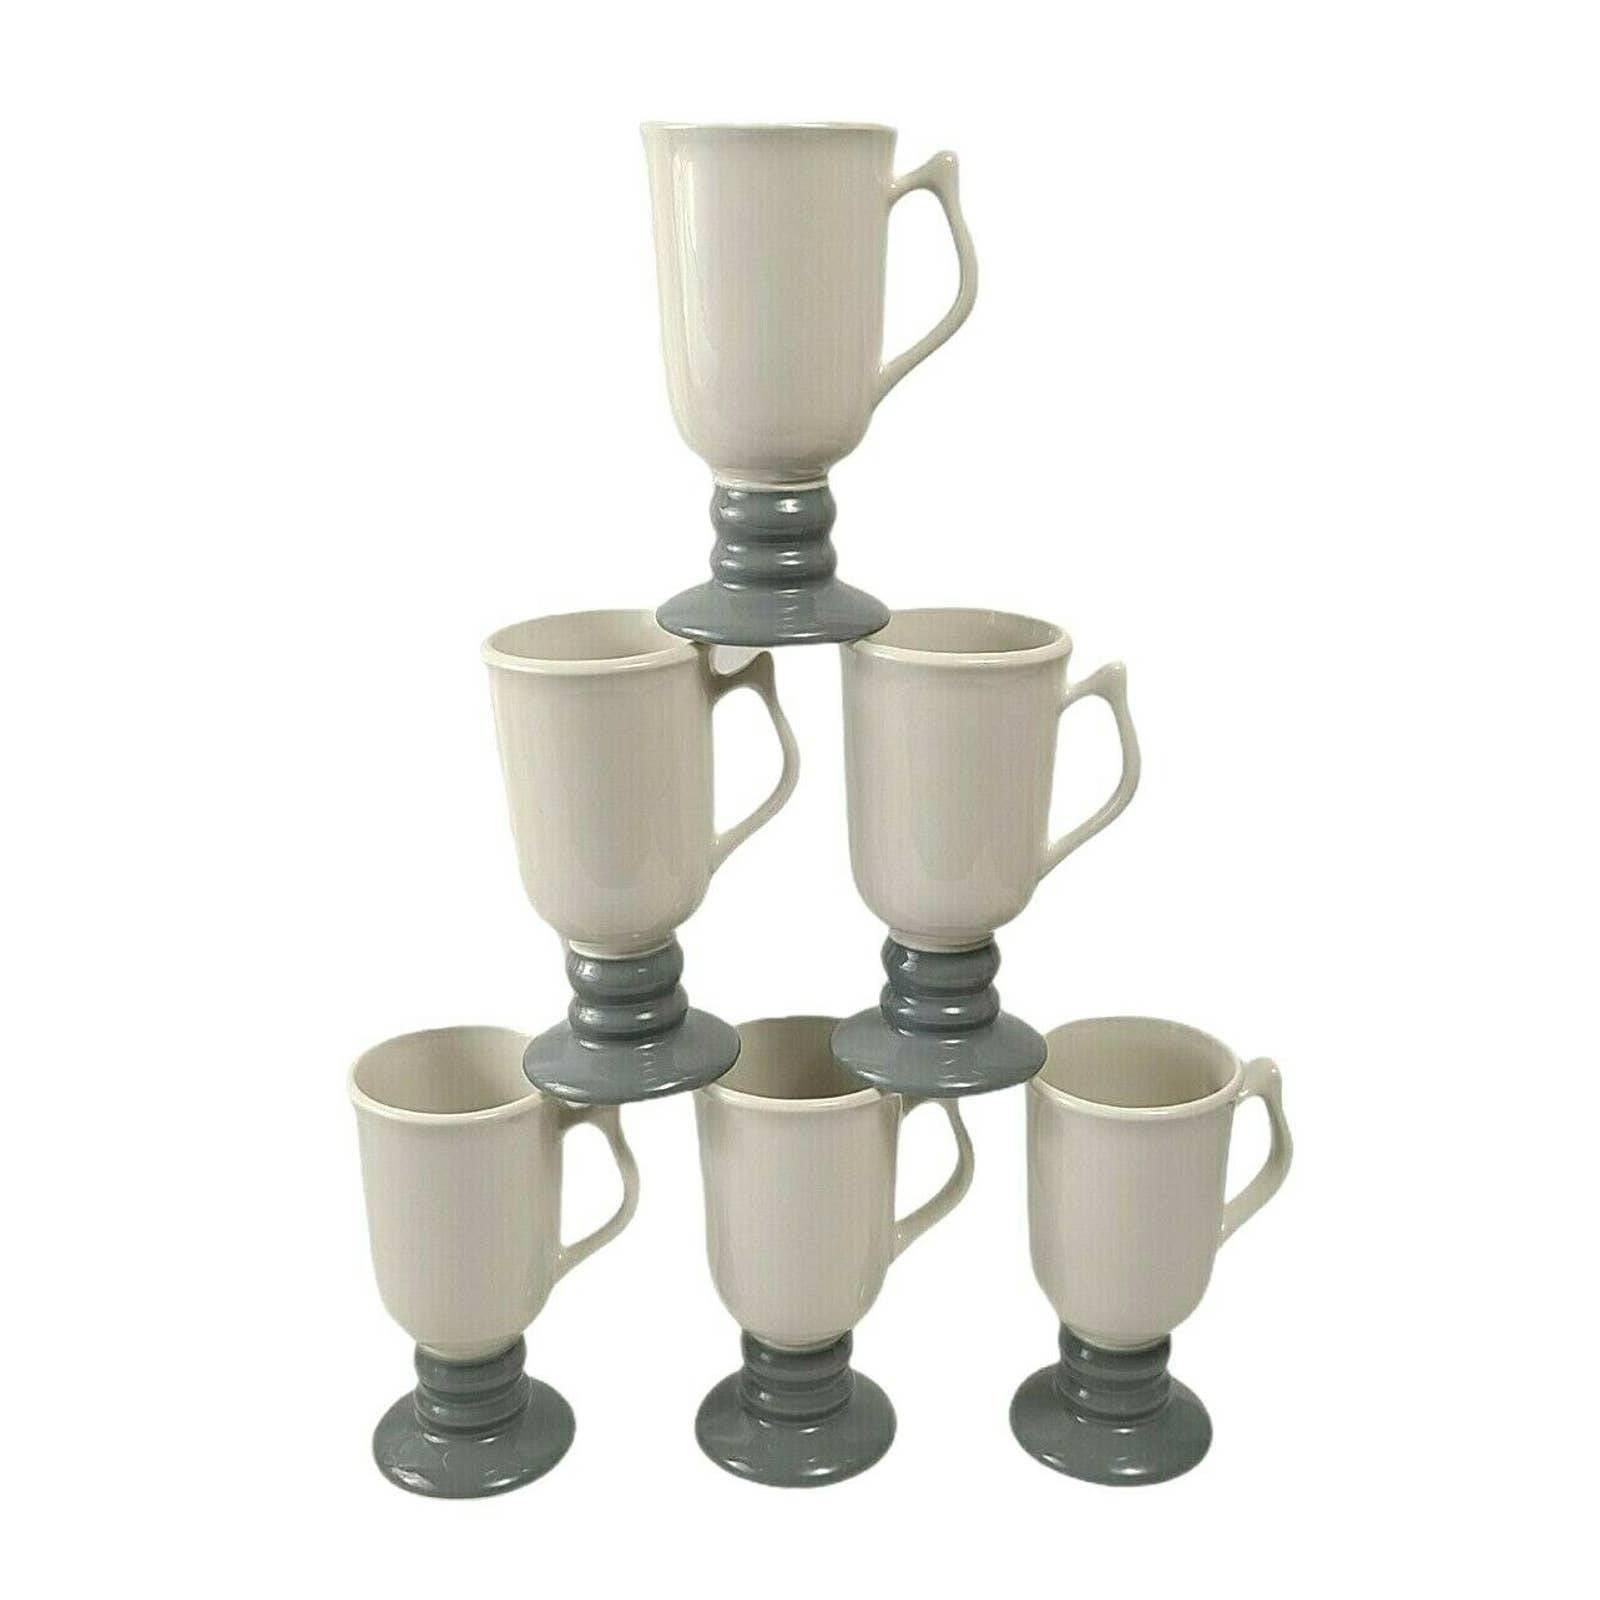 Vintage Hall Pedestal Mugs Gray Base Set